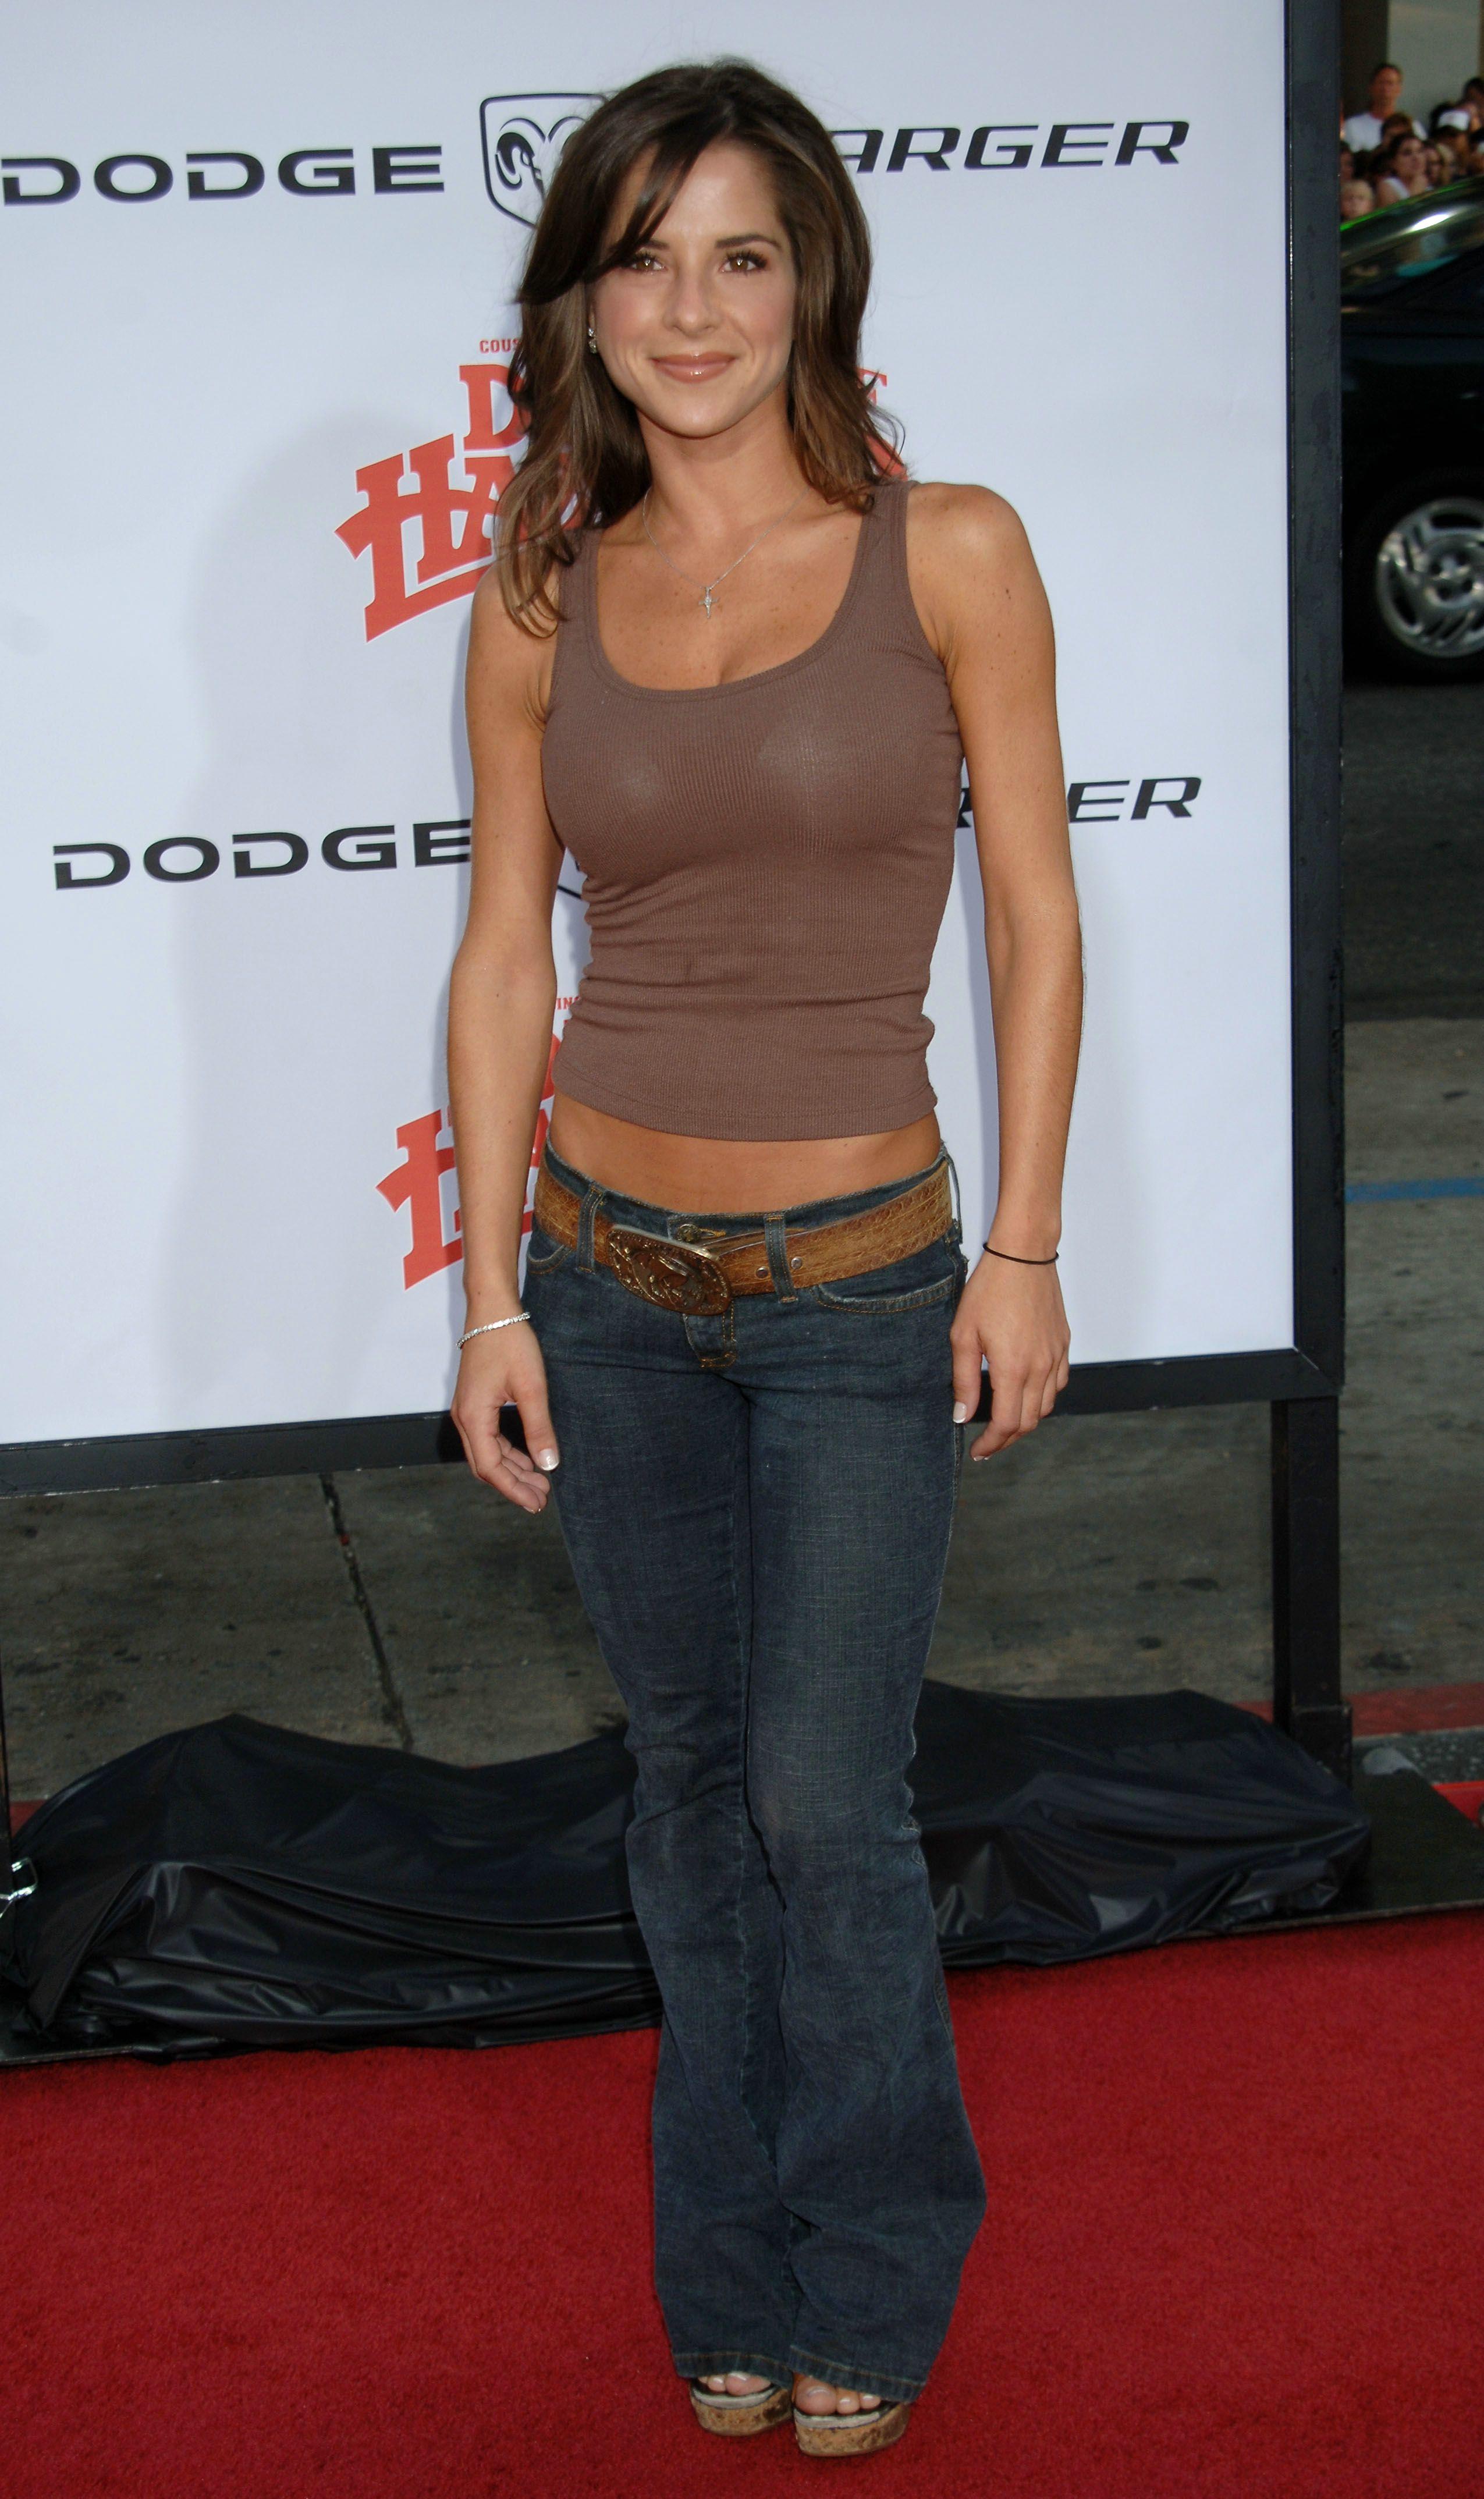 Cheryl burke dating 2011 4